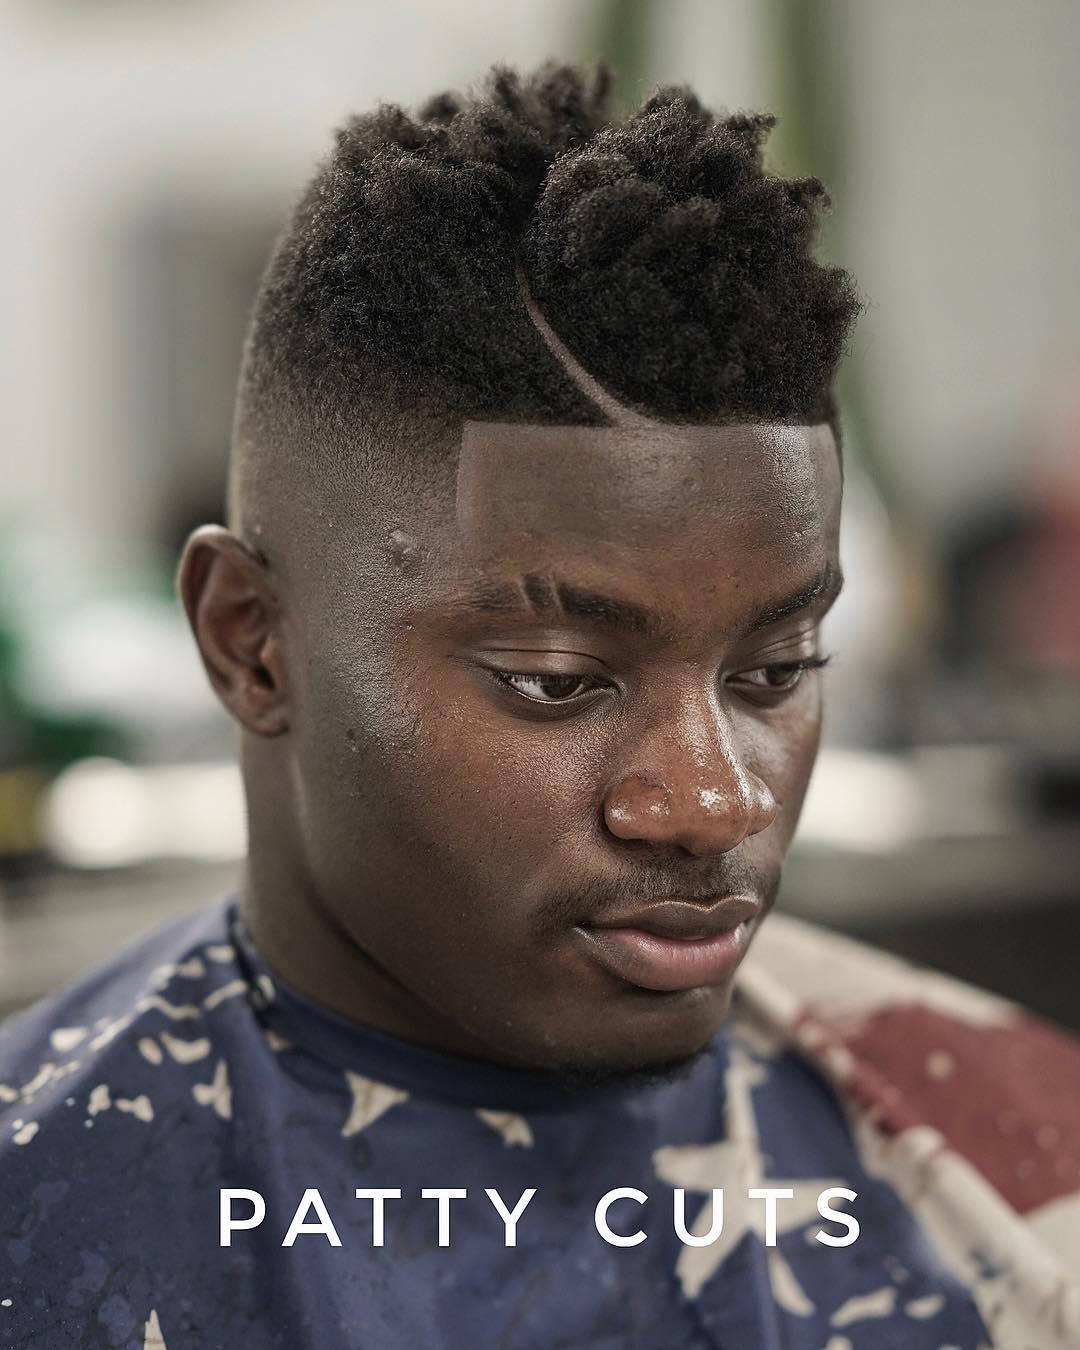 pattycuts high fade moon part black men haircut